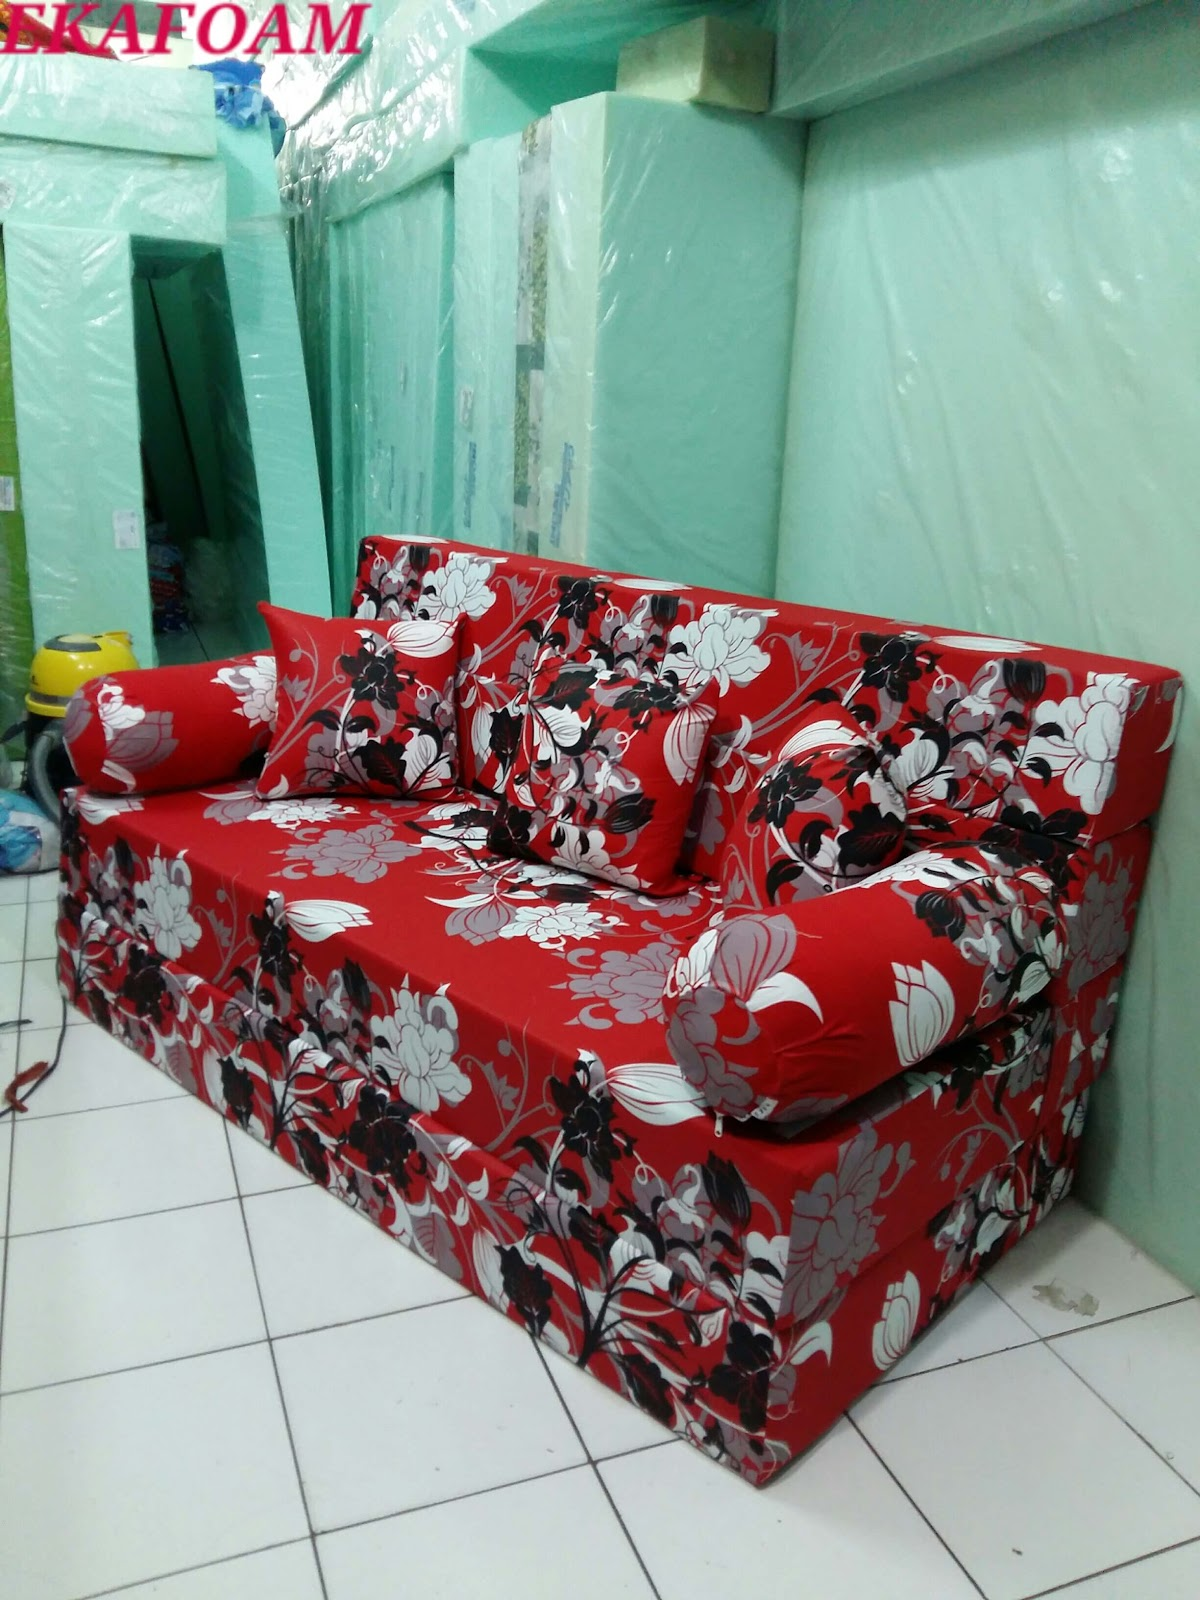 Harga Sofa Bed Inoac 2017 Set Under 10000 Rs Terbaru Agen Jual Kasur Busa